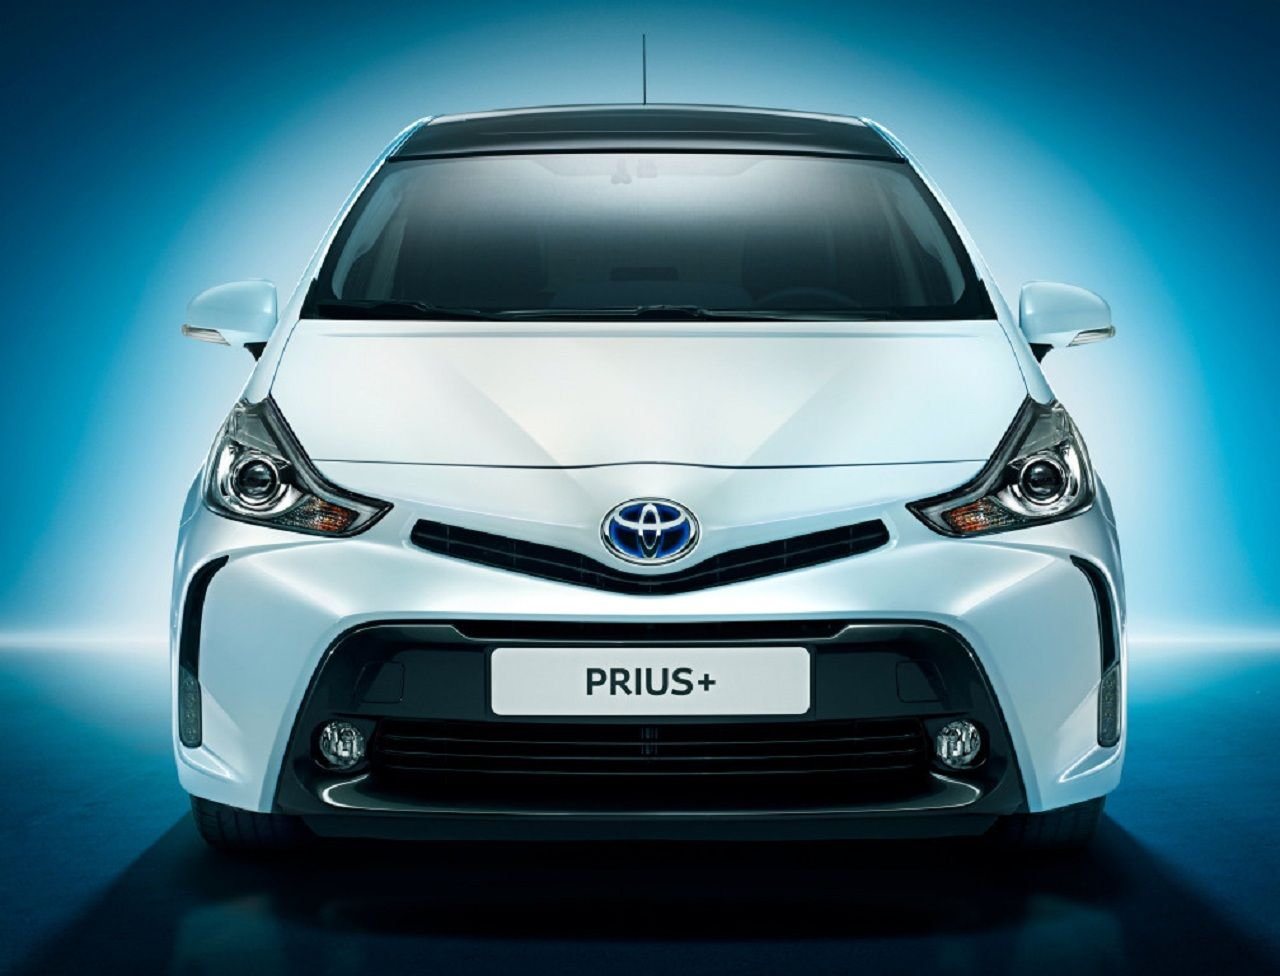 2017 Toyota Prius C Hybrid Review and Price